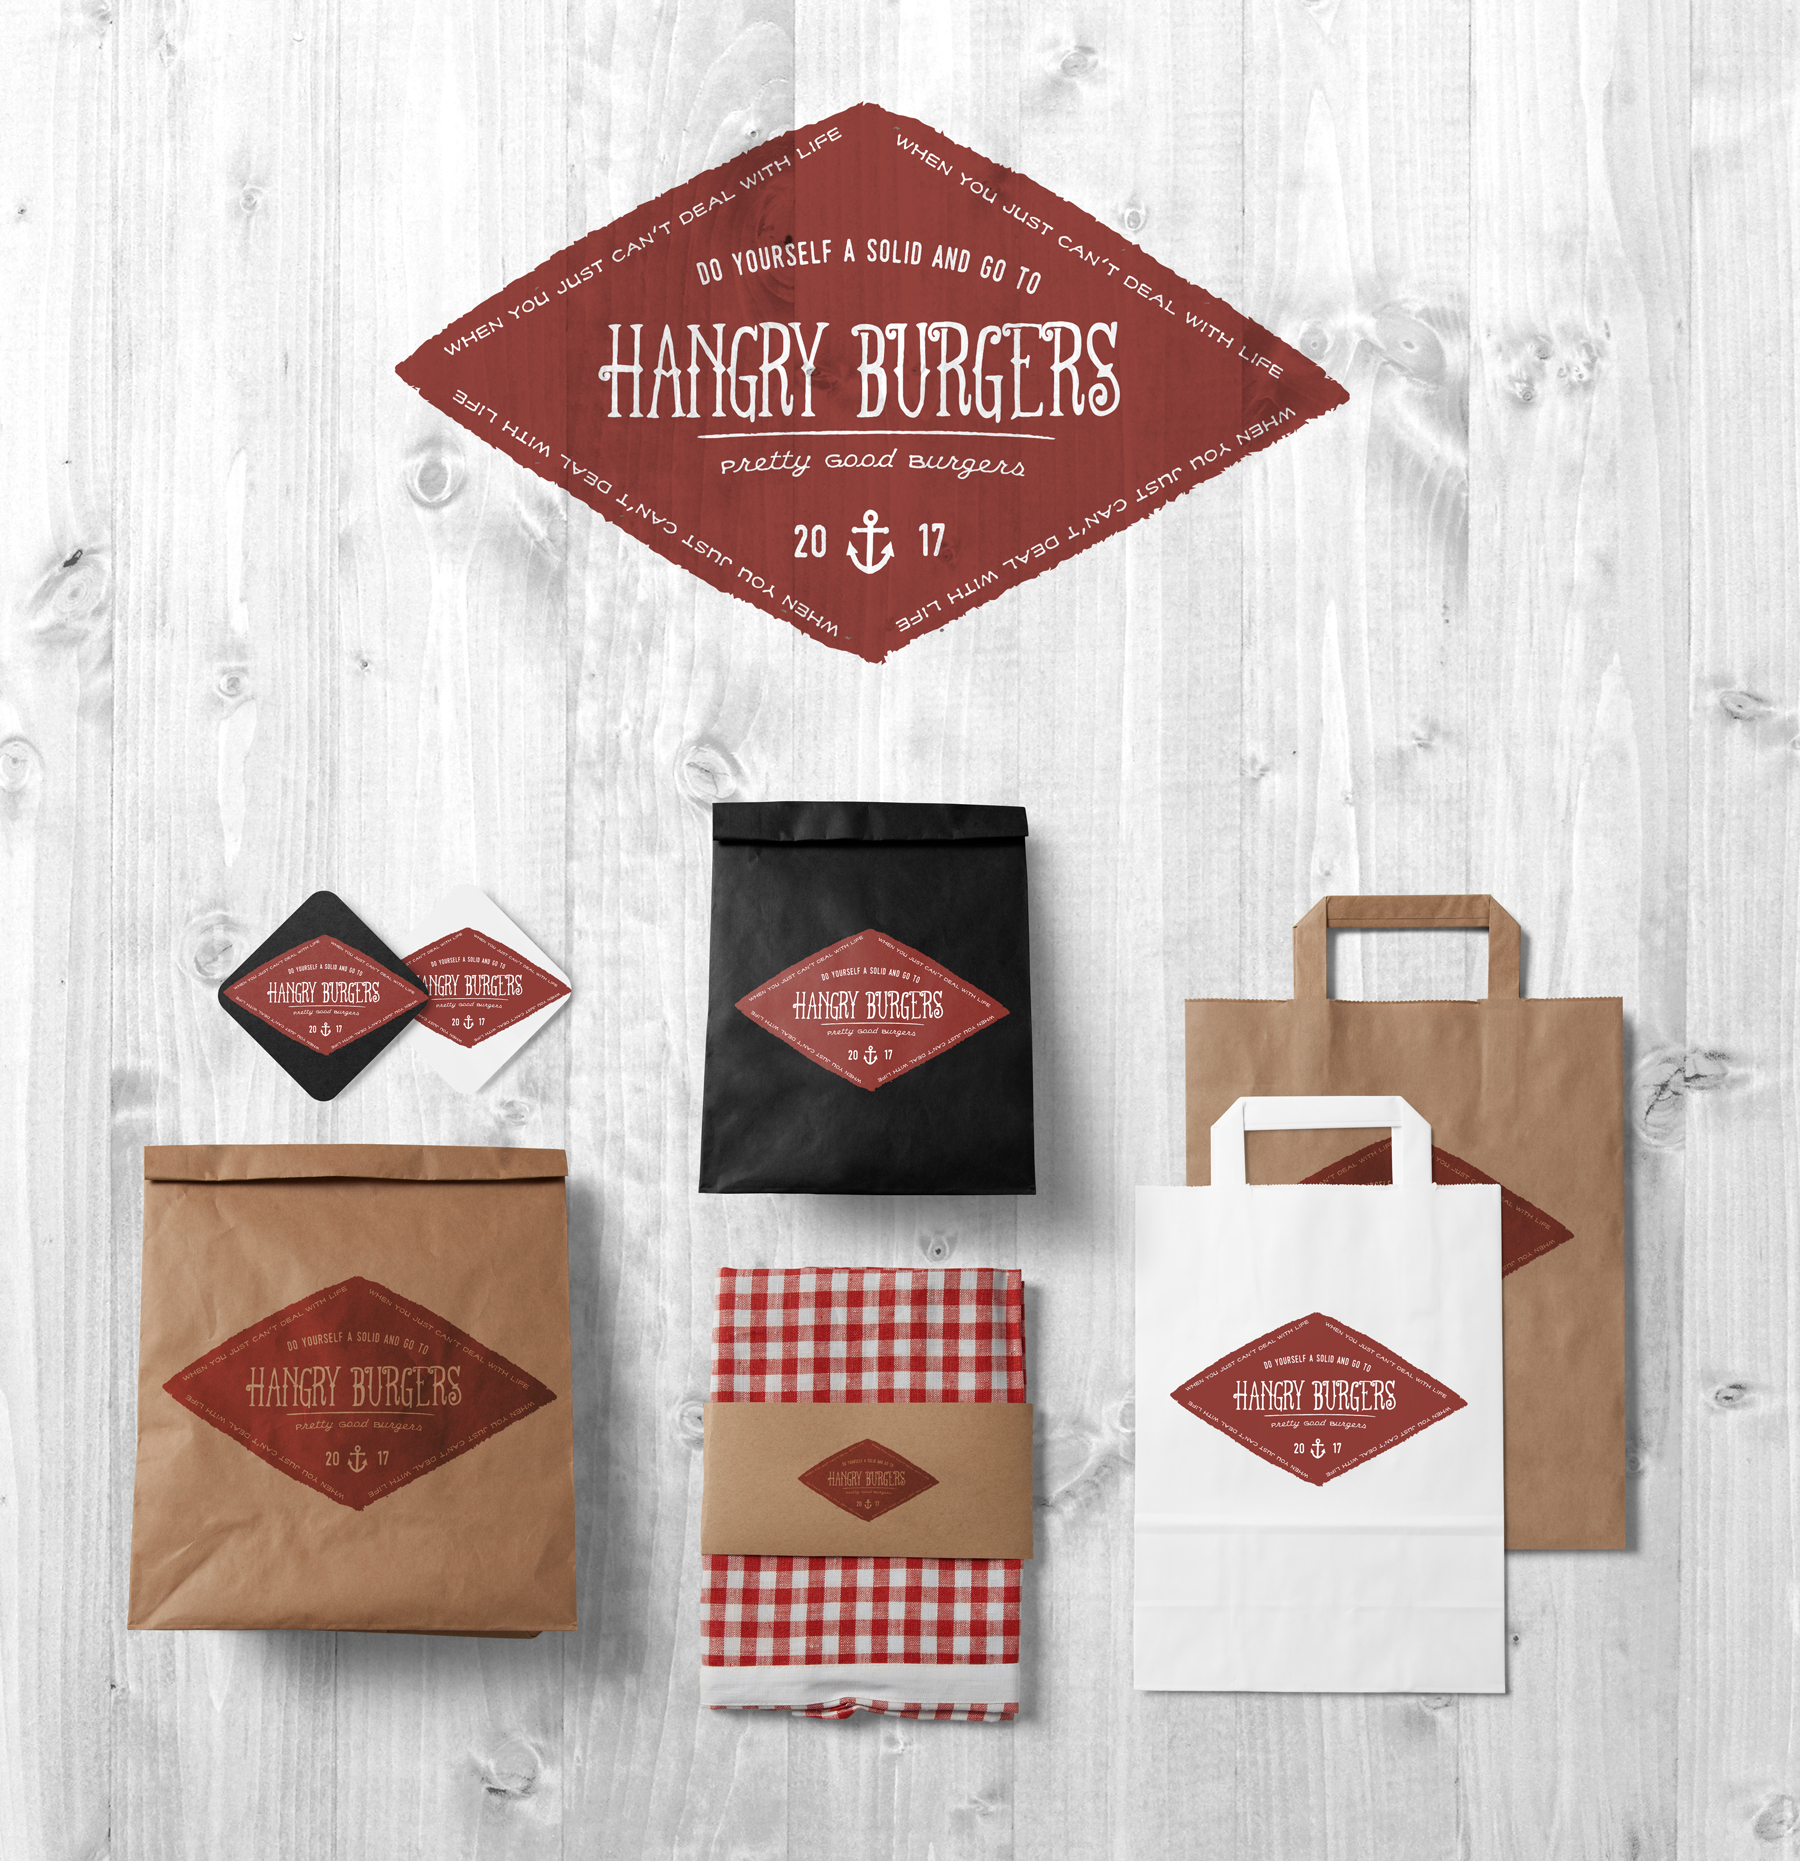 hangry_burger_w_logo.jpg